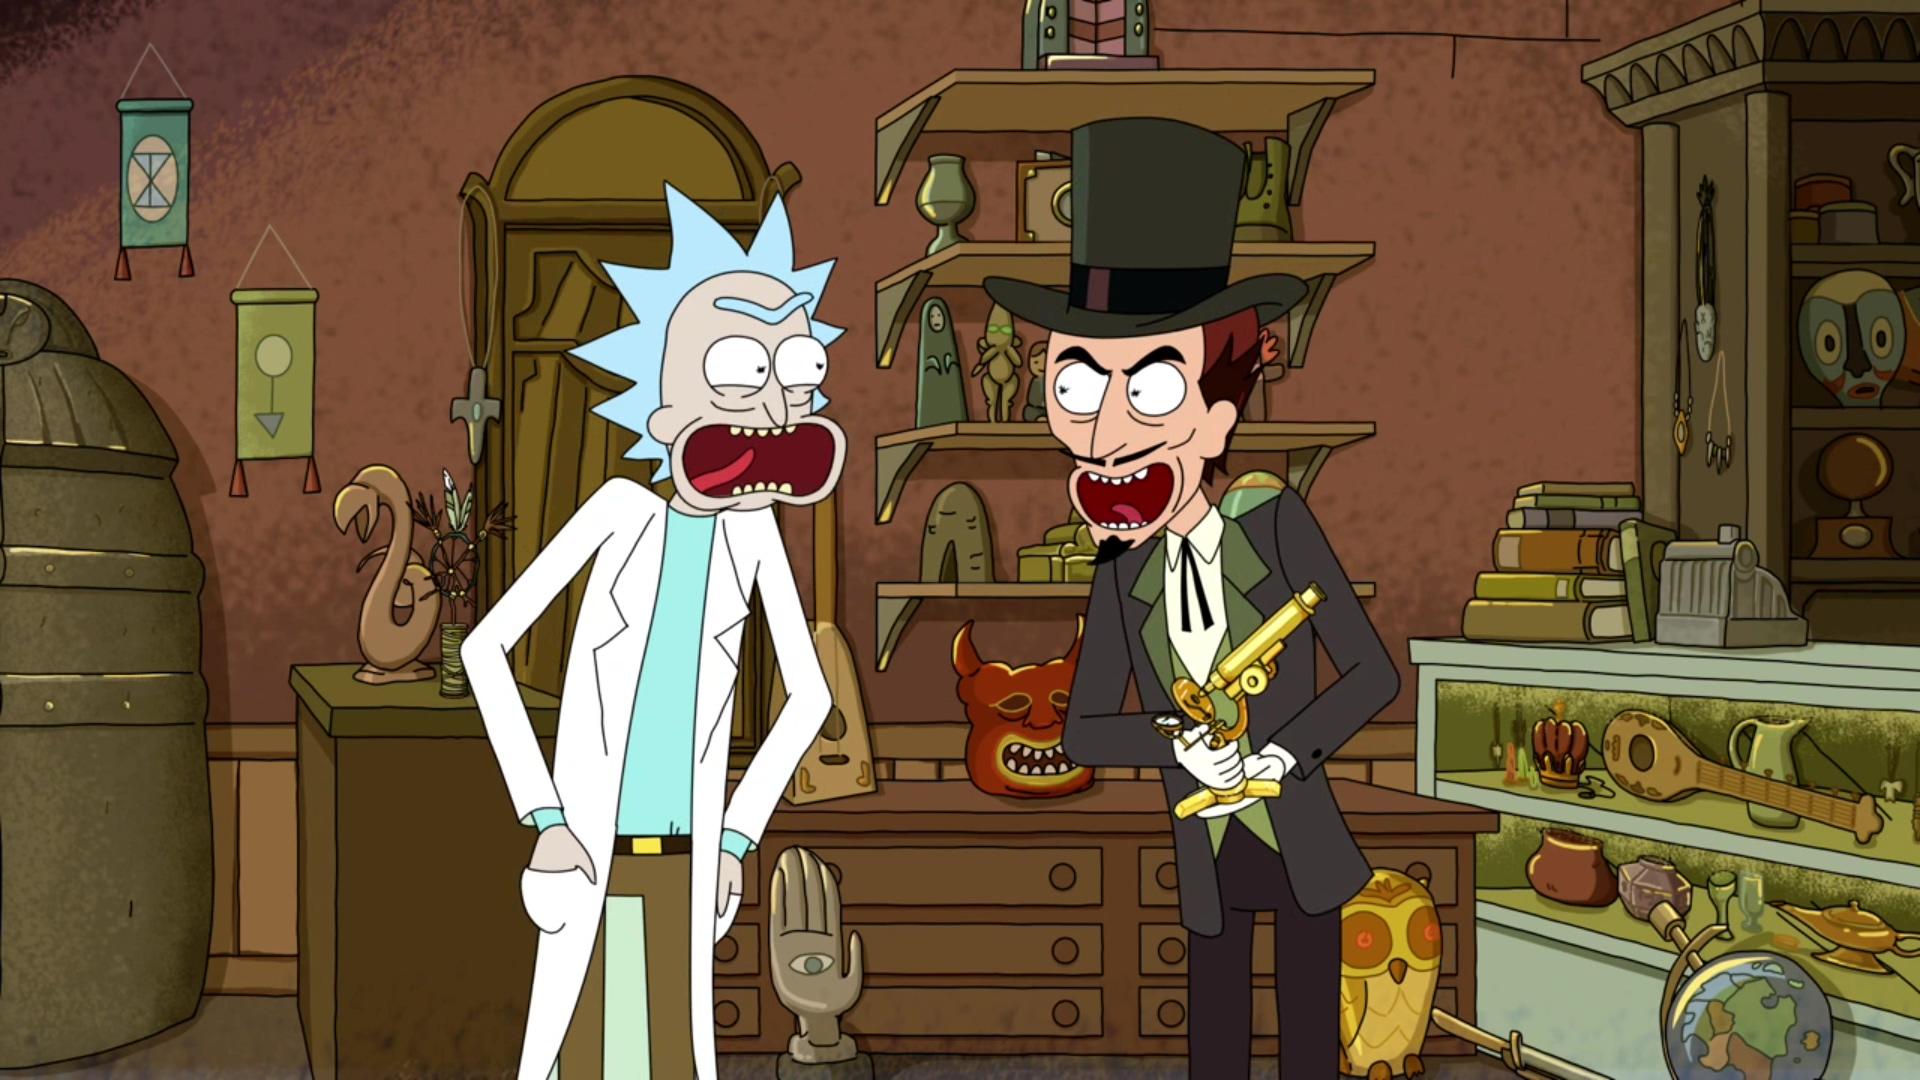 Rick.and.Morty.S01E09.Something.Ricked.This.Way.Comes.720p.RUS-VO-sienduk.WEB-DL-CYRUS.mkv_20140330_132017.187.jpg